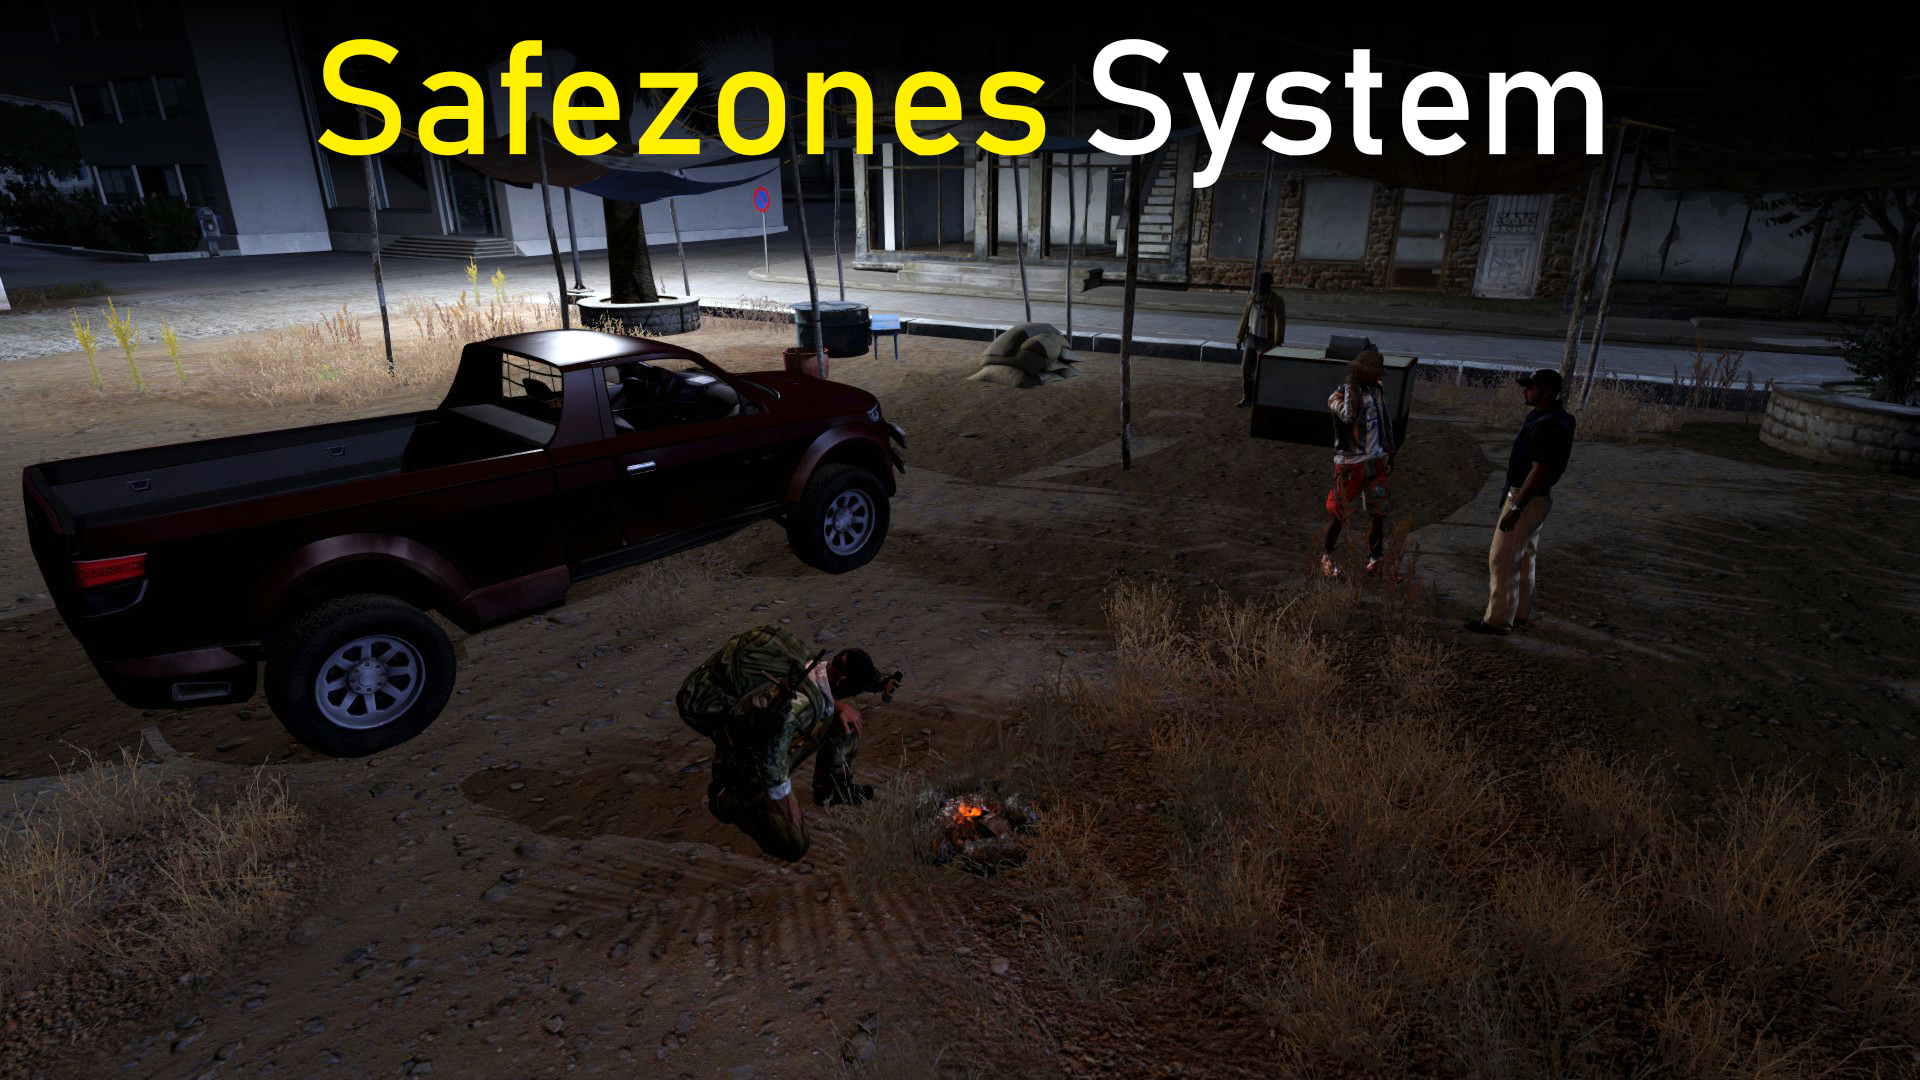 Safezones System